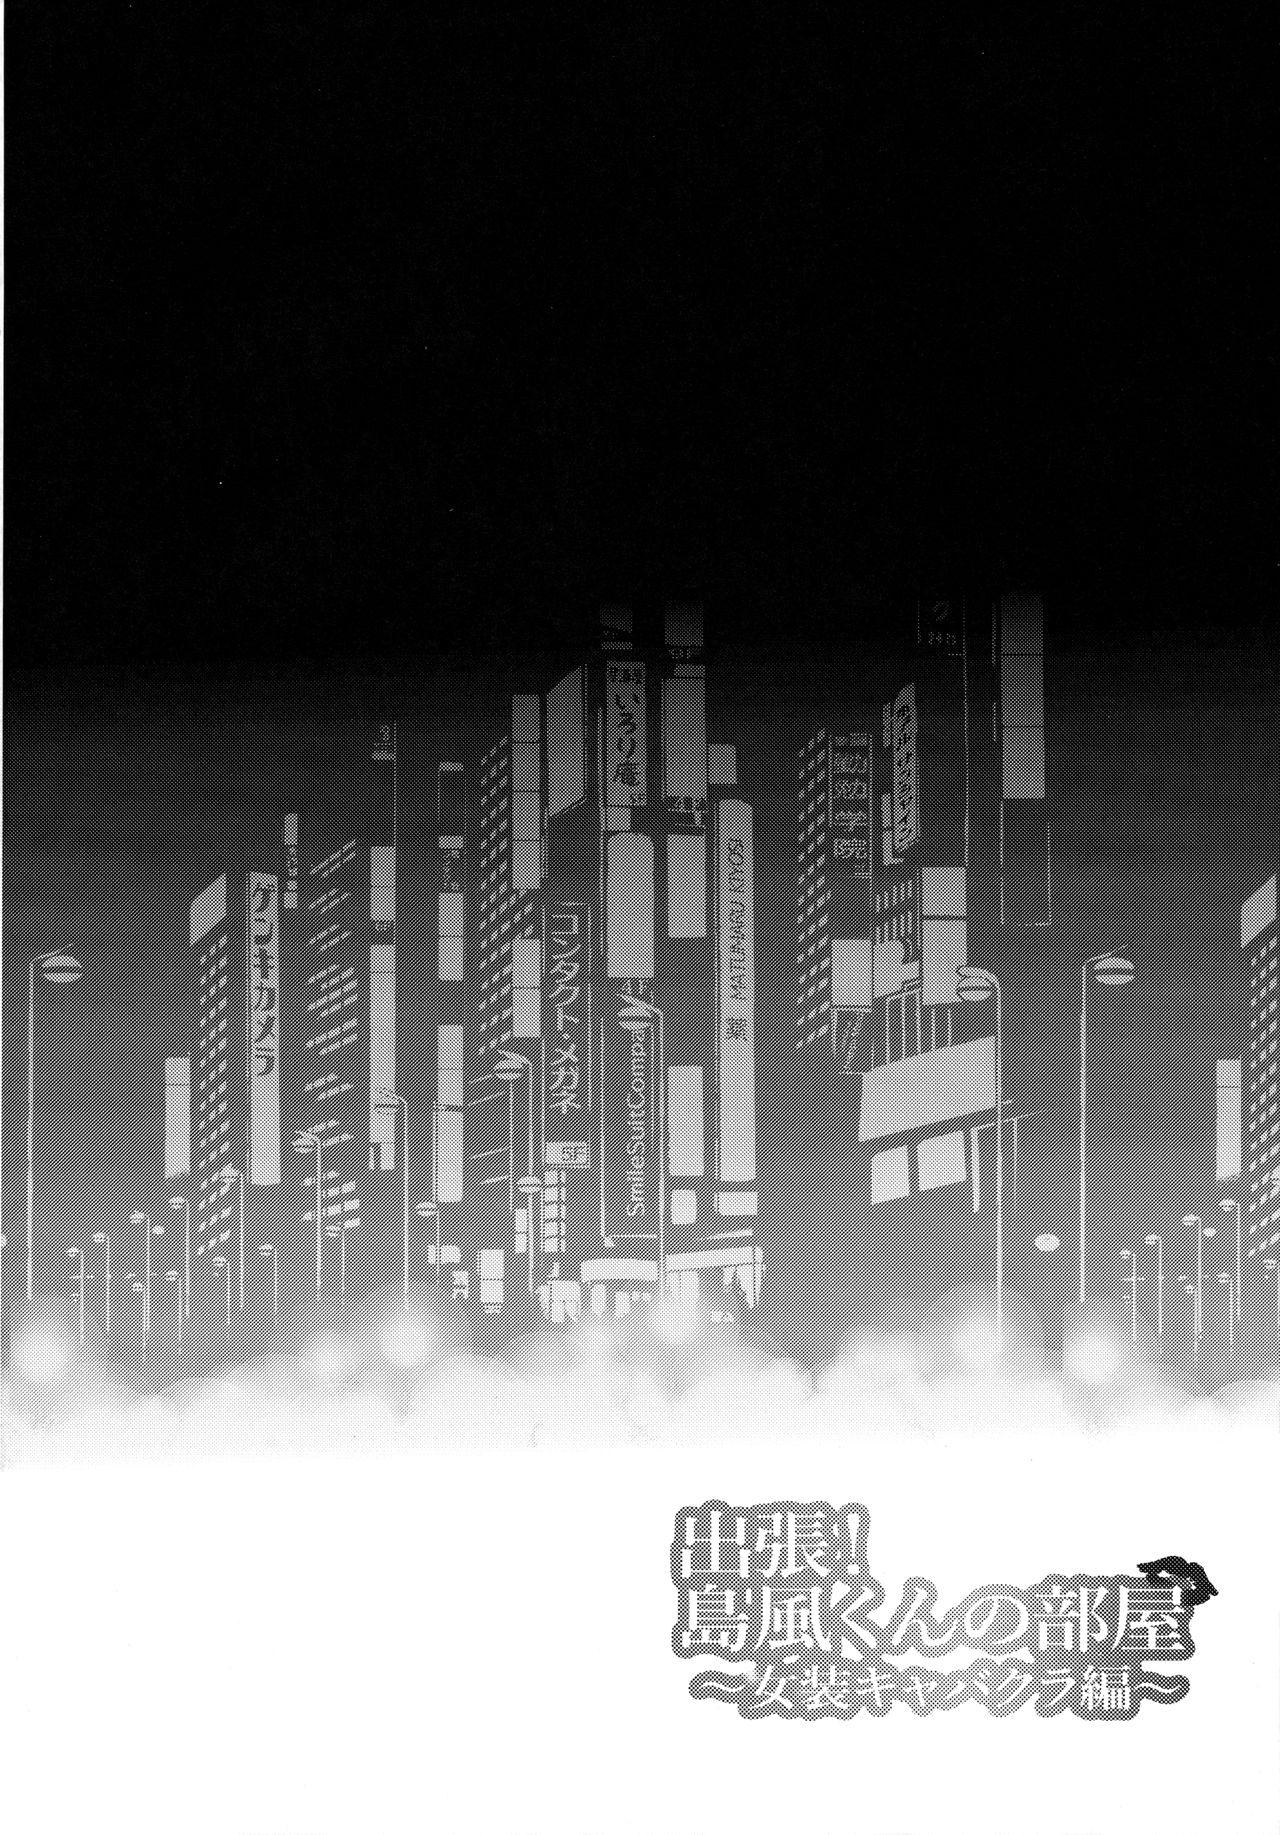 (C91) [Inariya (Inari)] Shucchou! Shimakaze-kun no Heya -Josou CabaClu Hen- (Kantai Collection -KanColle-) [English] 2